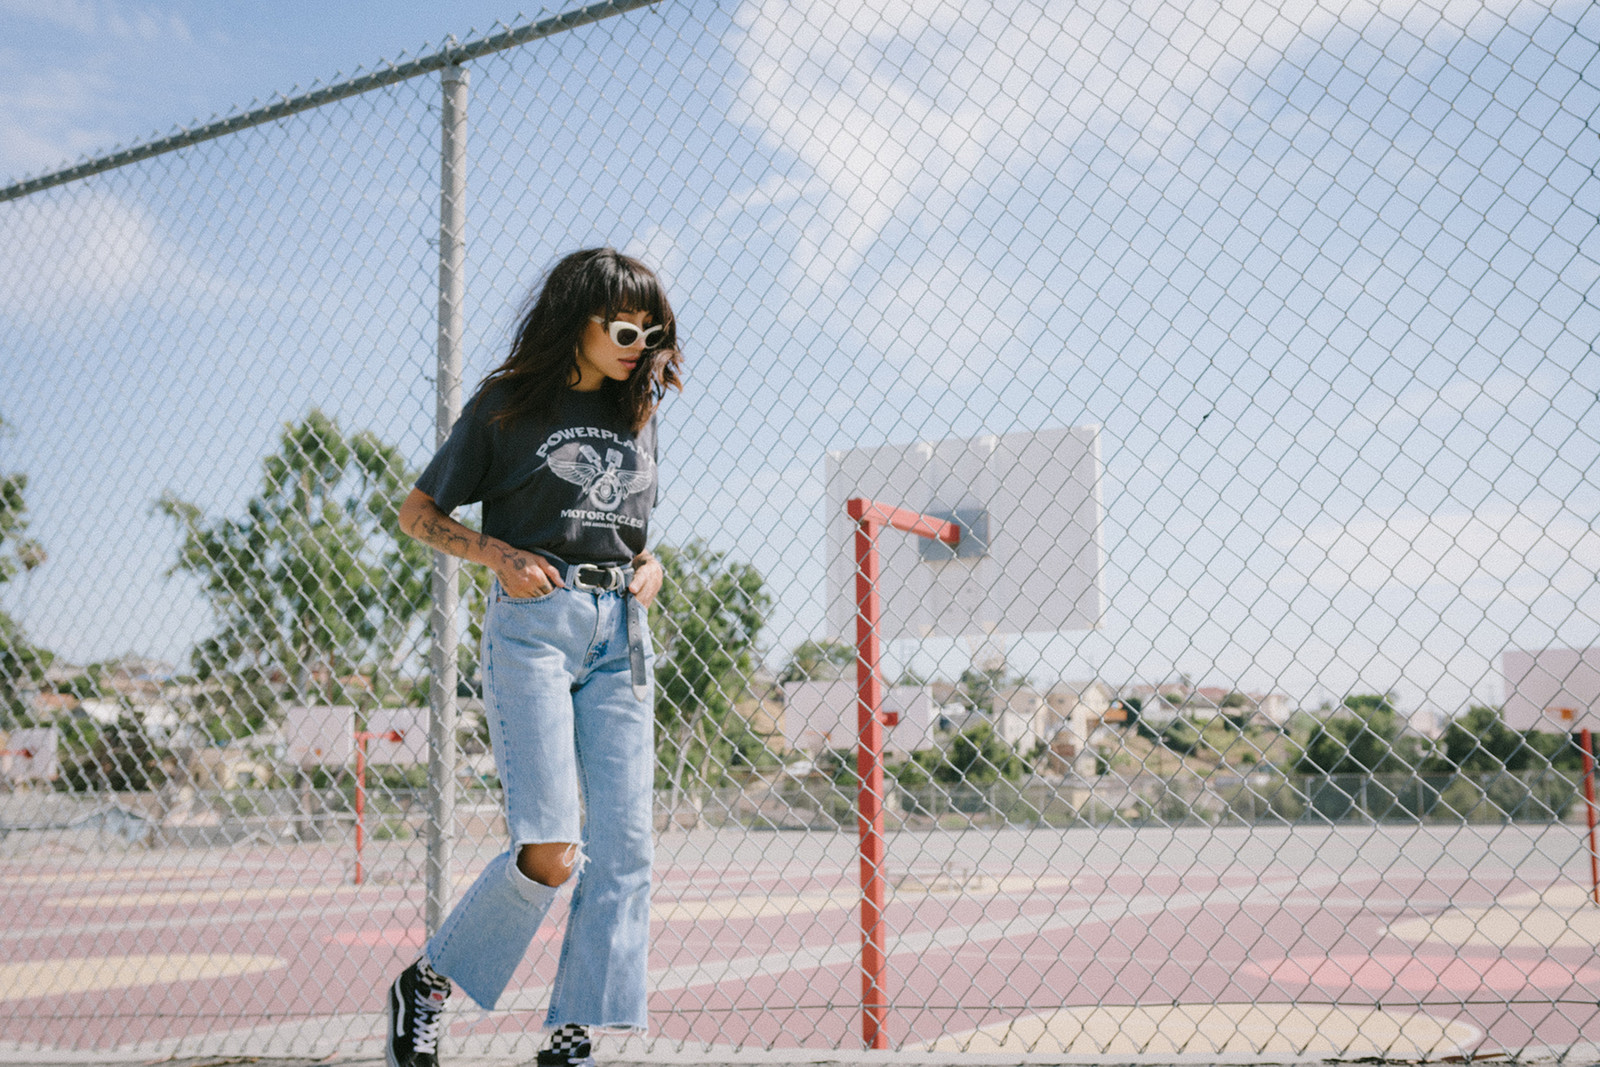 Holywater Alie Layus BAEwatch DJ Photographer Fashion Curator Model Los Angeles Virgin Gold Cult Hush Cruel Youth